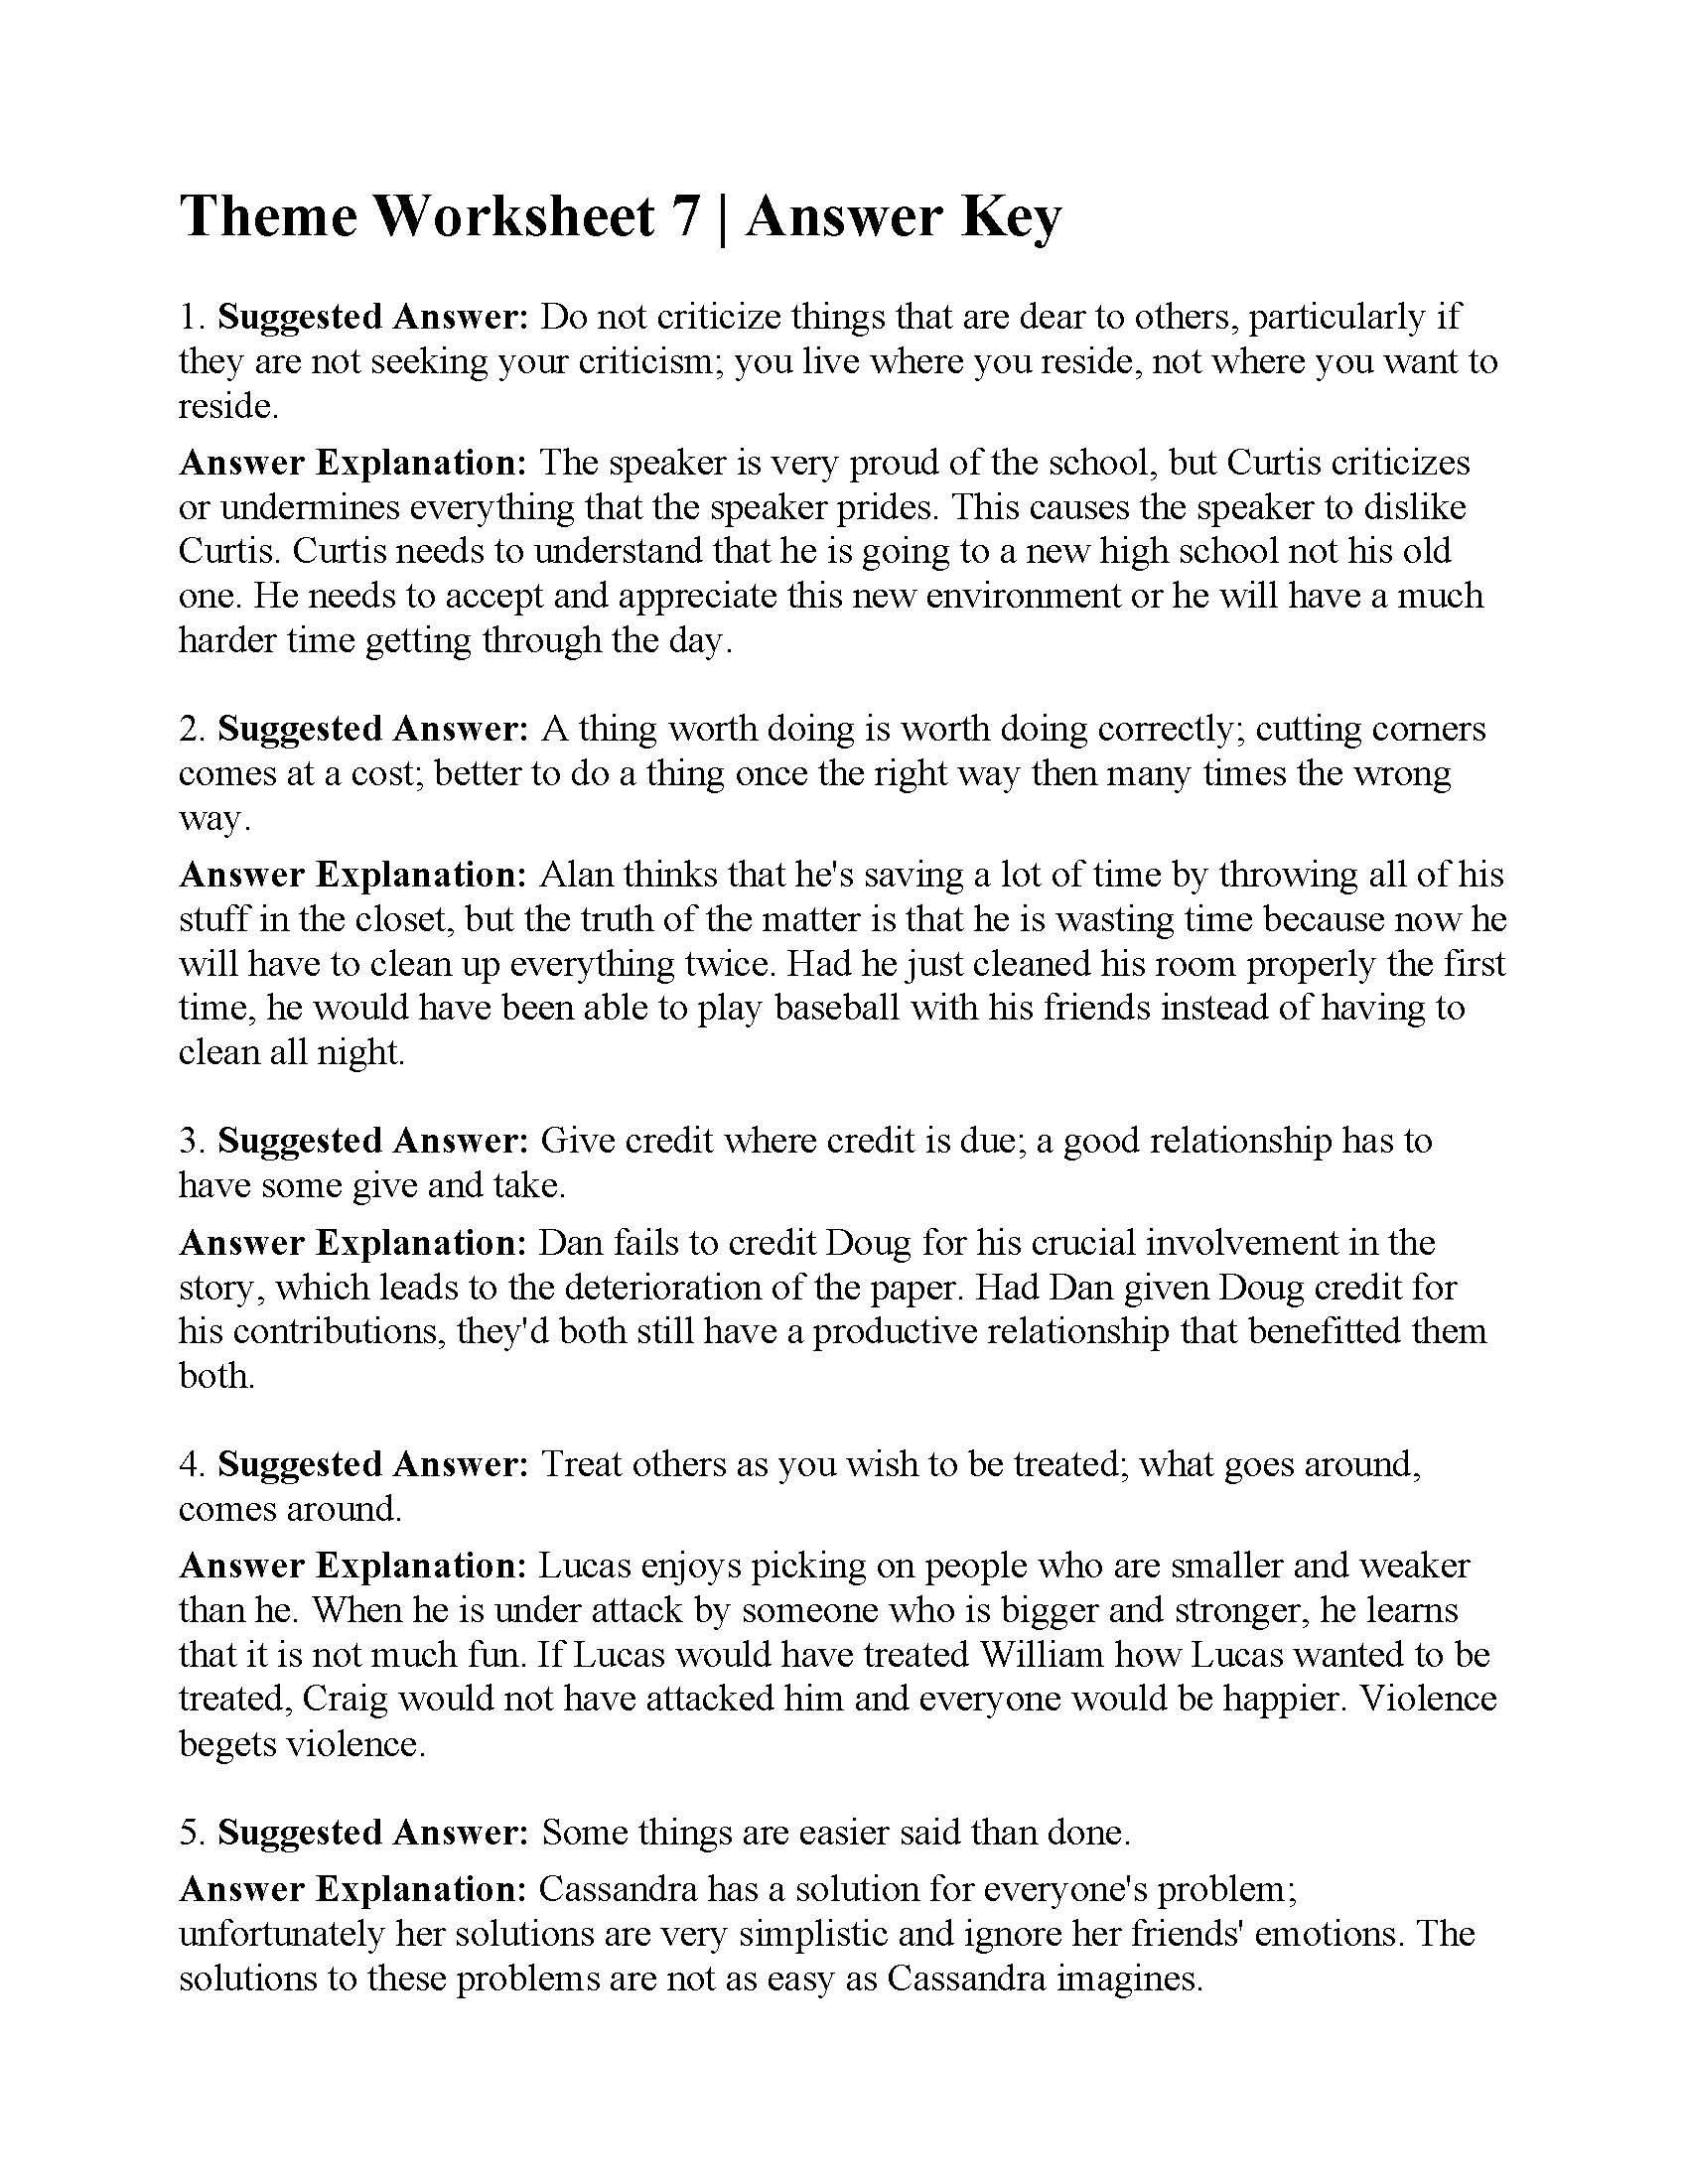 Theme Worksheets for 5th Grade theme Worksheet 7